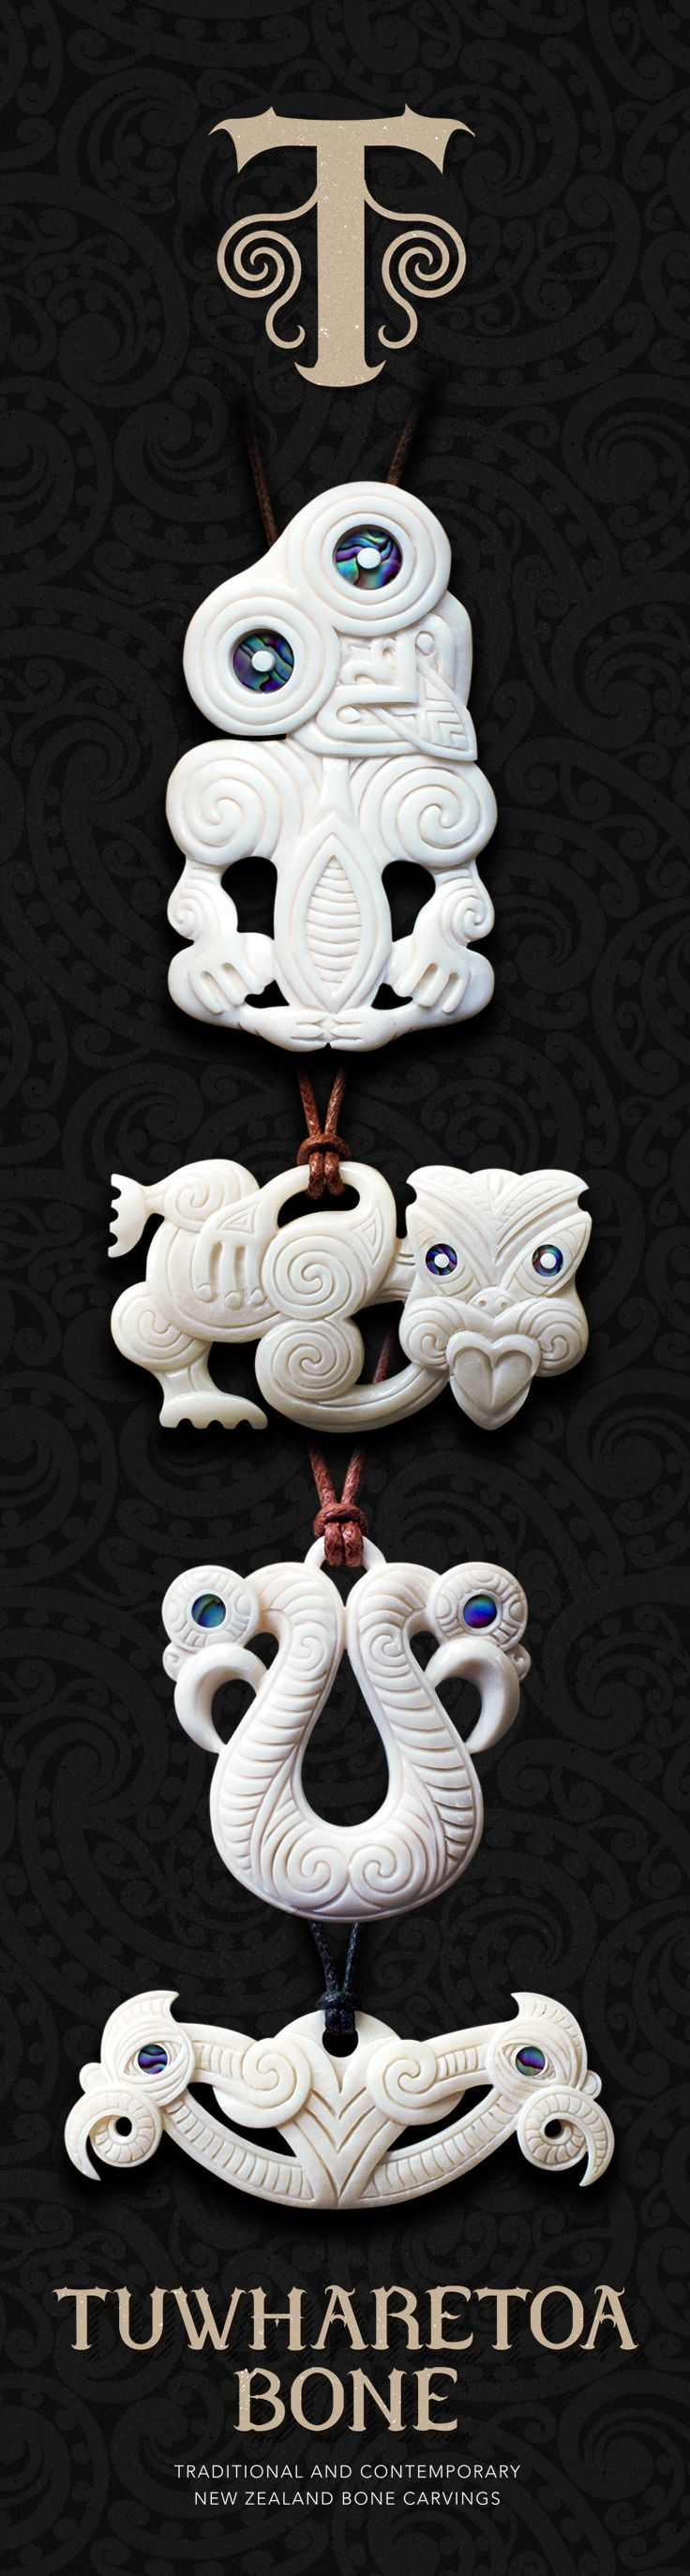 New Zealand Maori Bone Pendant Necklace and Jewelry